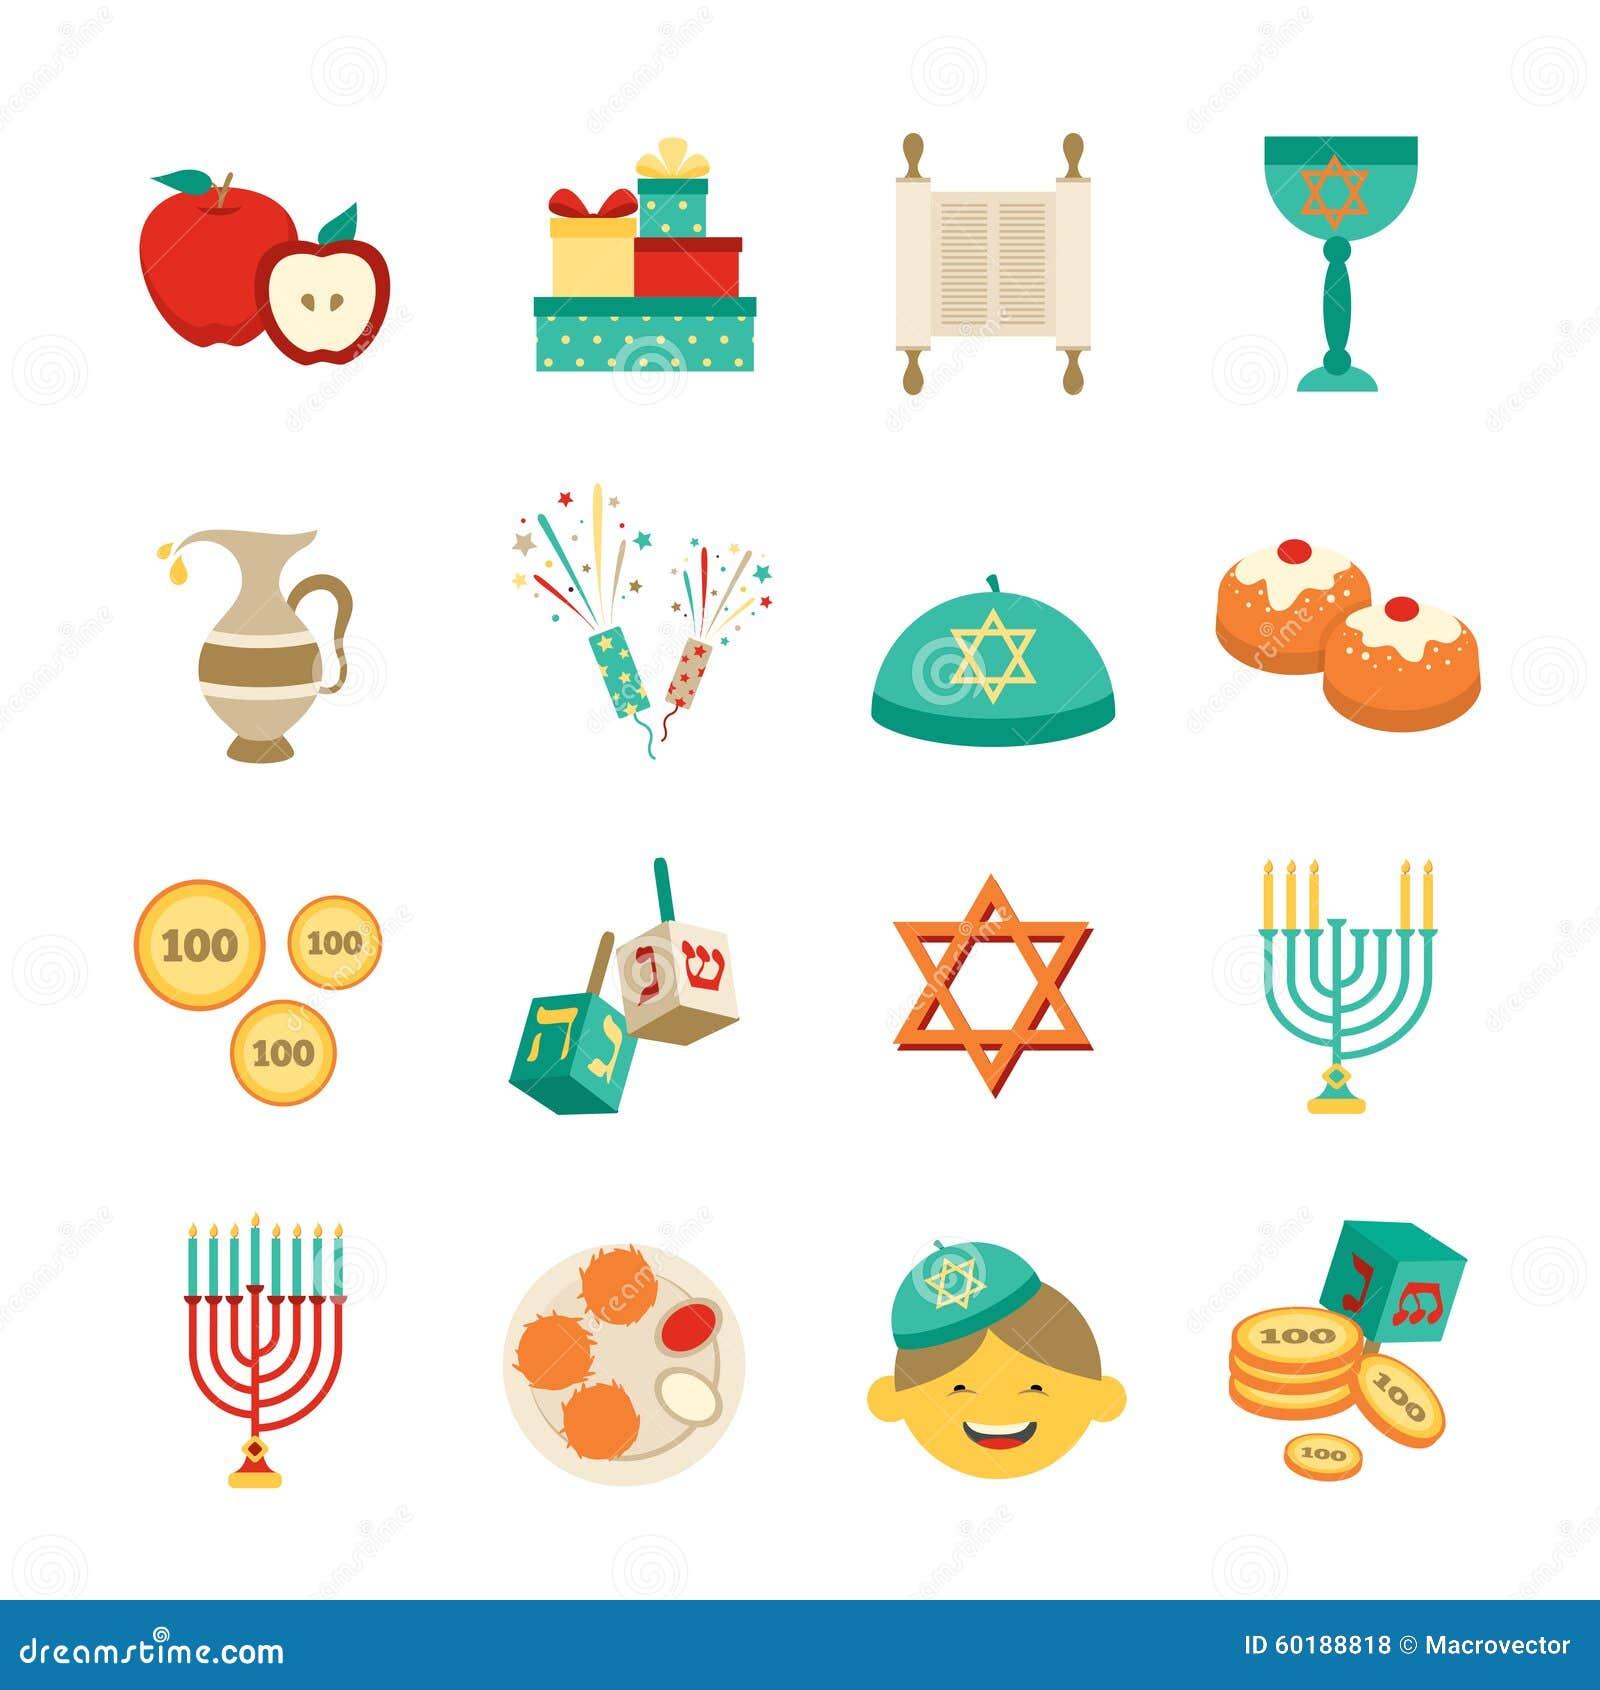 Uncategorized Chanukah Symbols symbols of hanukkah icons set stock vector image 60188818 royalty free download hanukkah